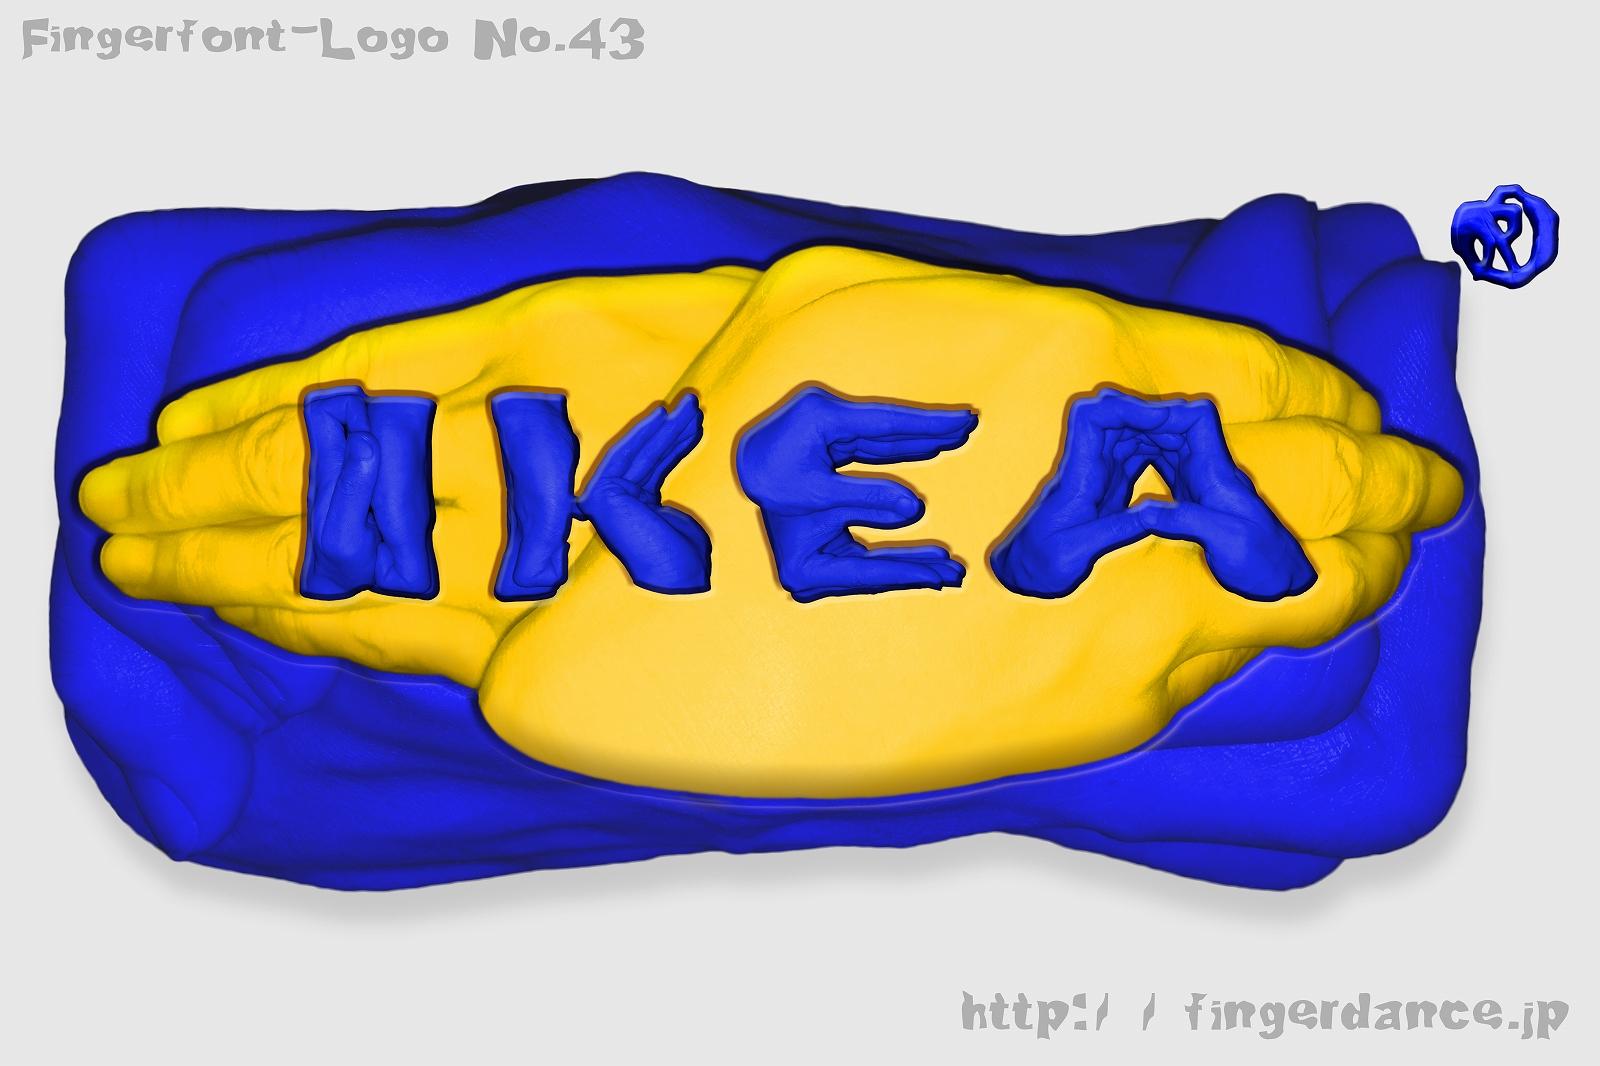 IKEA-fingerhttp://fingerdance.jp/L/logohand イケアフィンガーロゴハンド手指